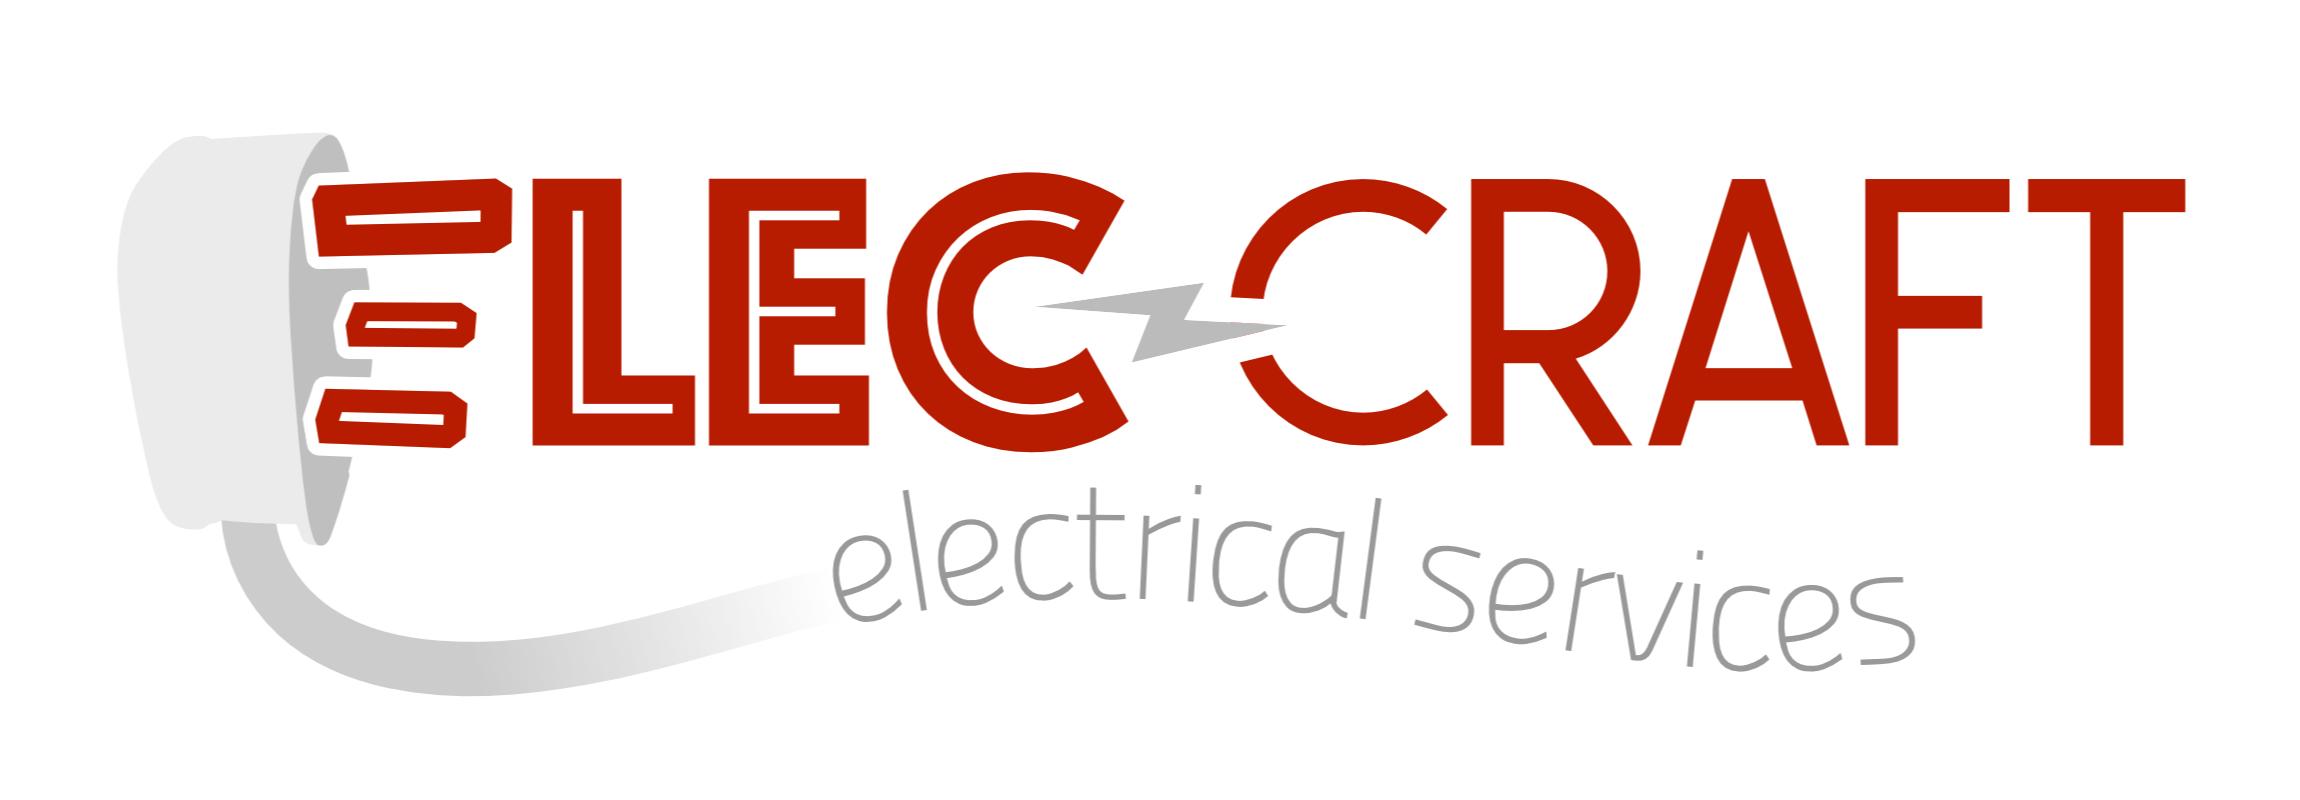 Elec-craft Electrical Services Verified Logo